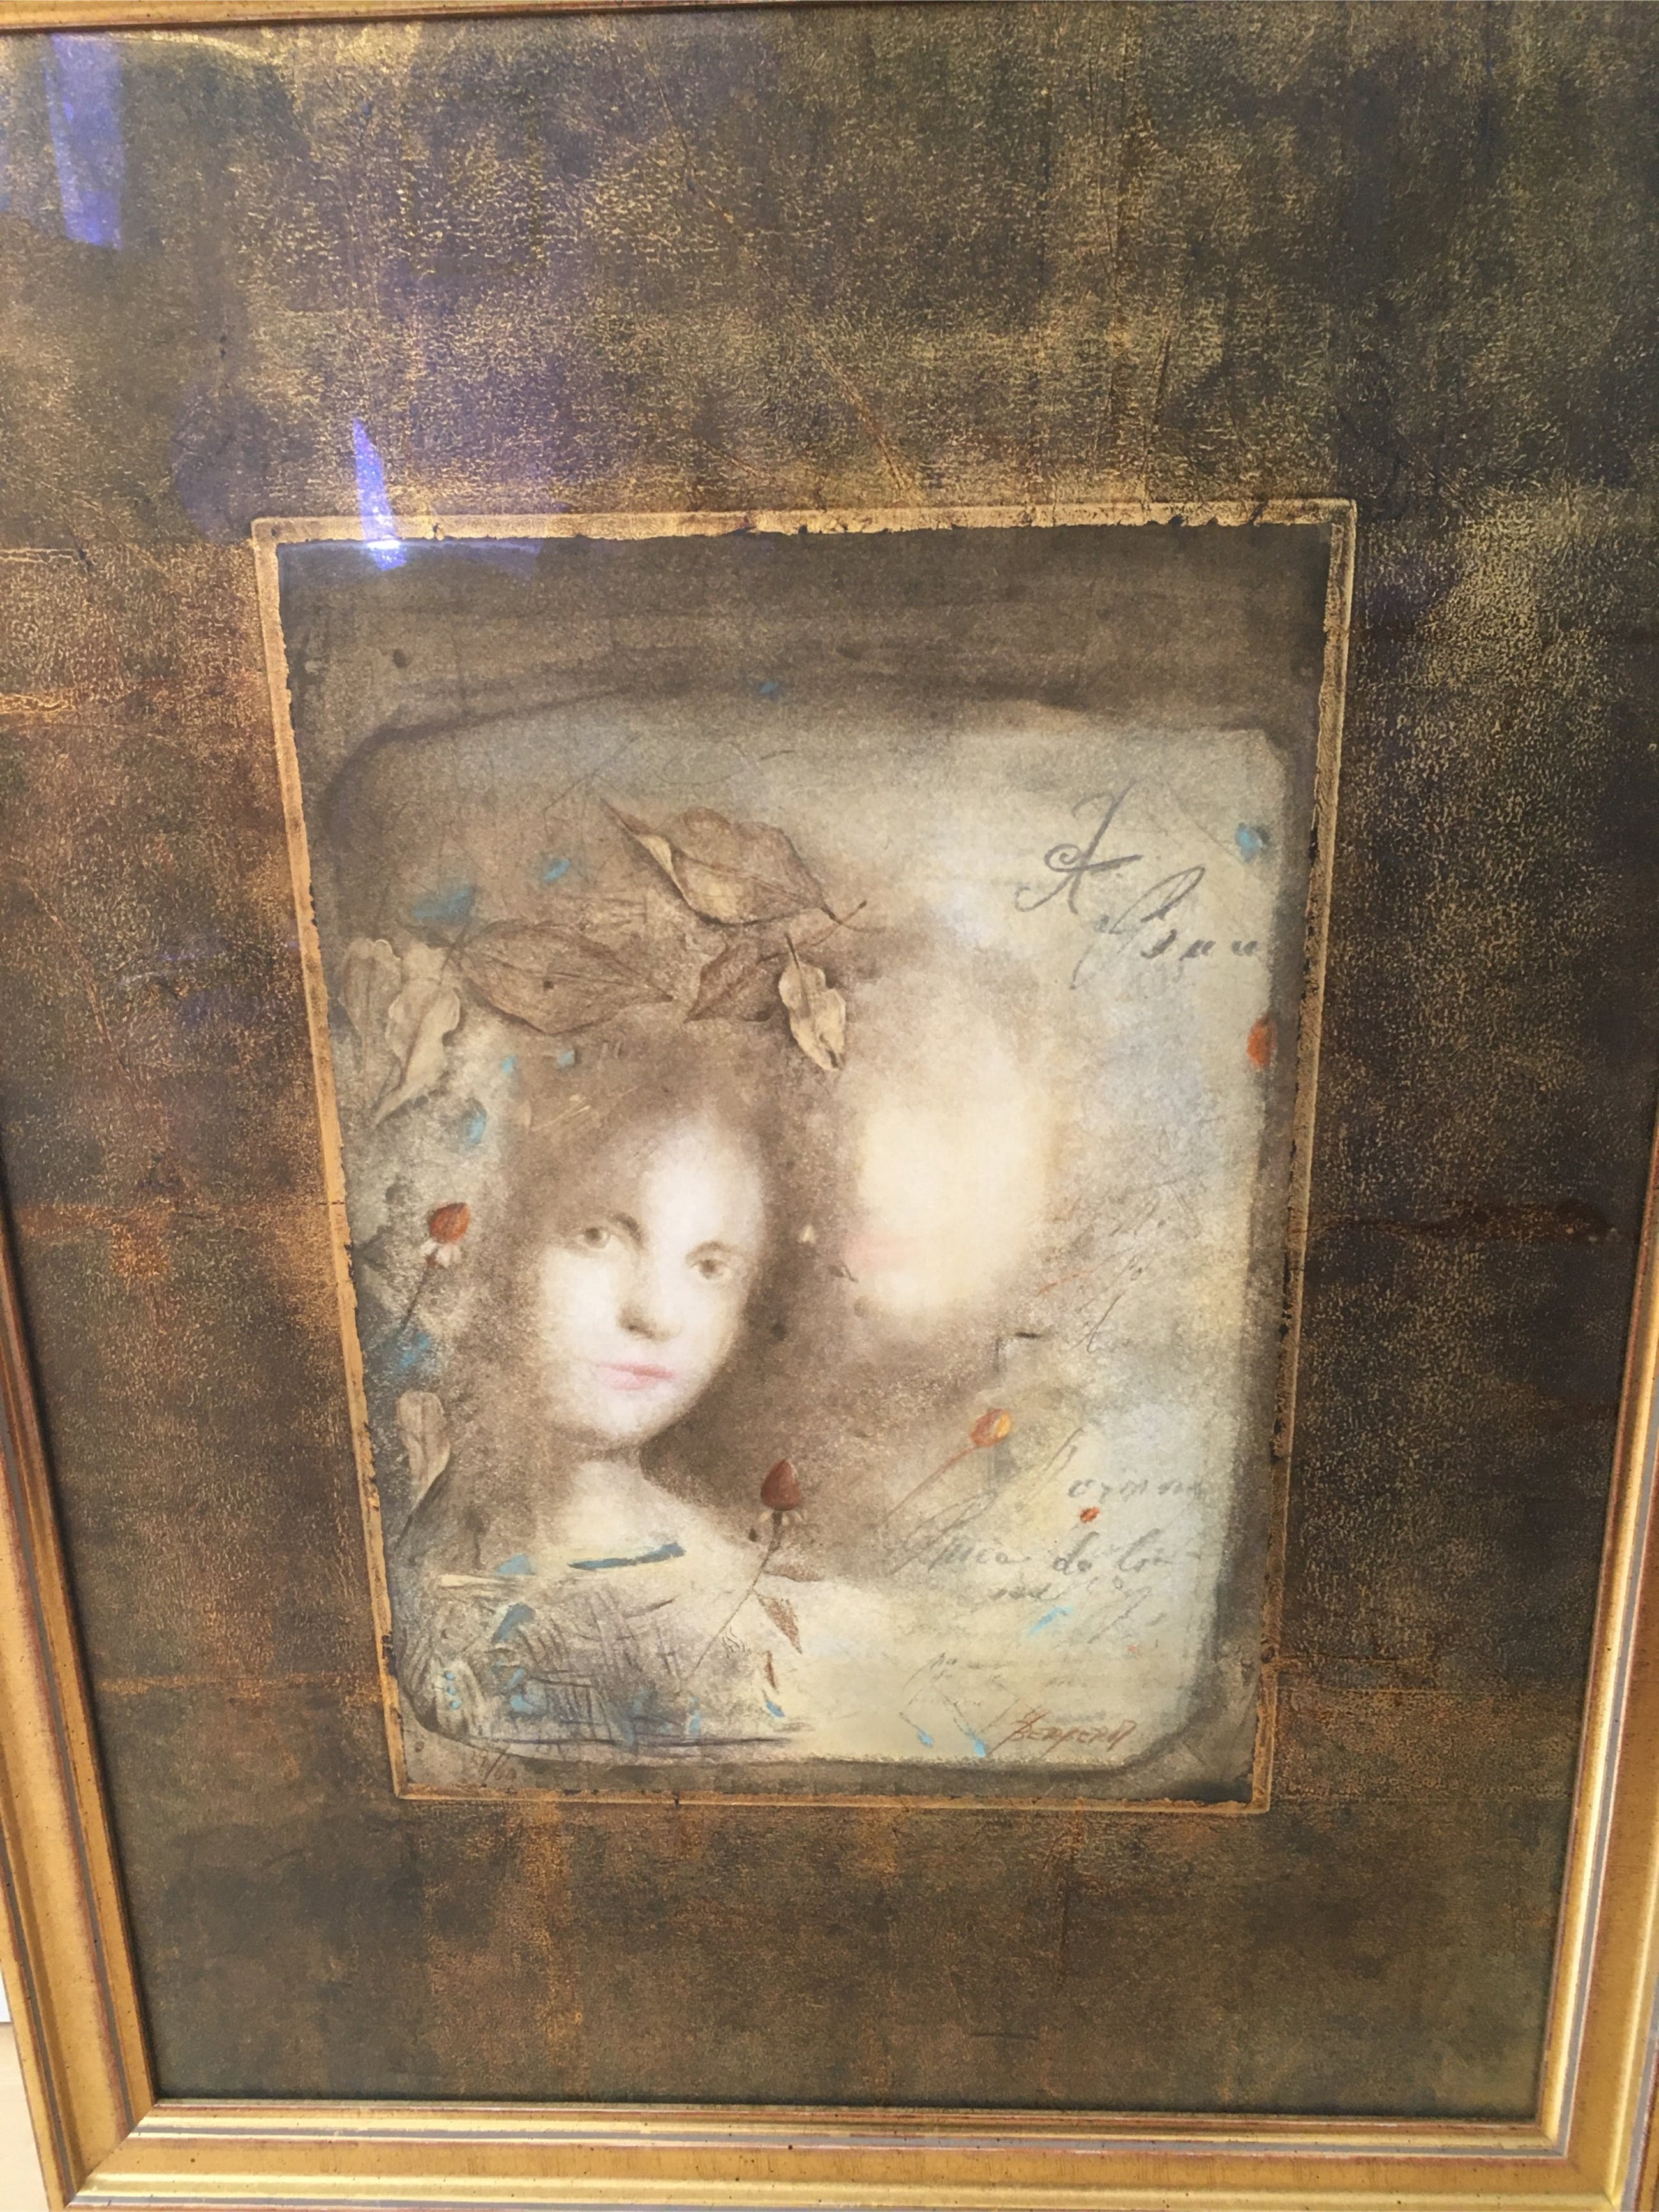 Mersad Berber - Porträt einer jungen Frau mit geschlossenen Rosen, umgeben von Textframenten kopen? Bied vanaf 390!